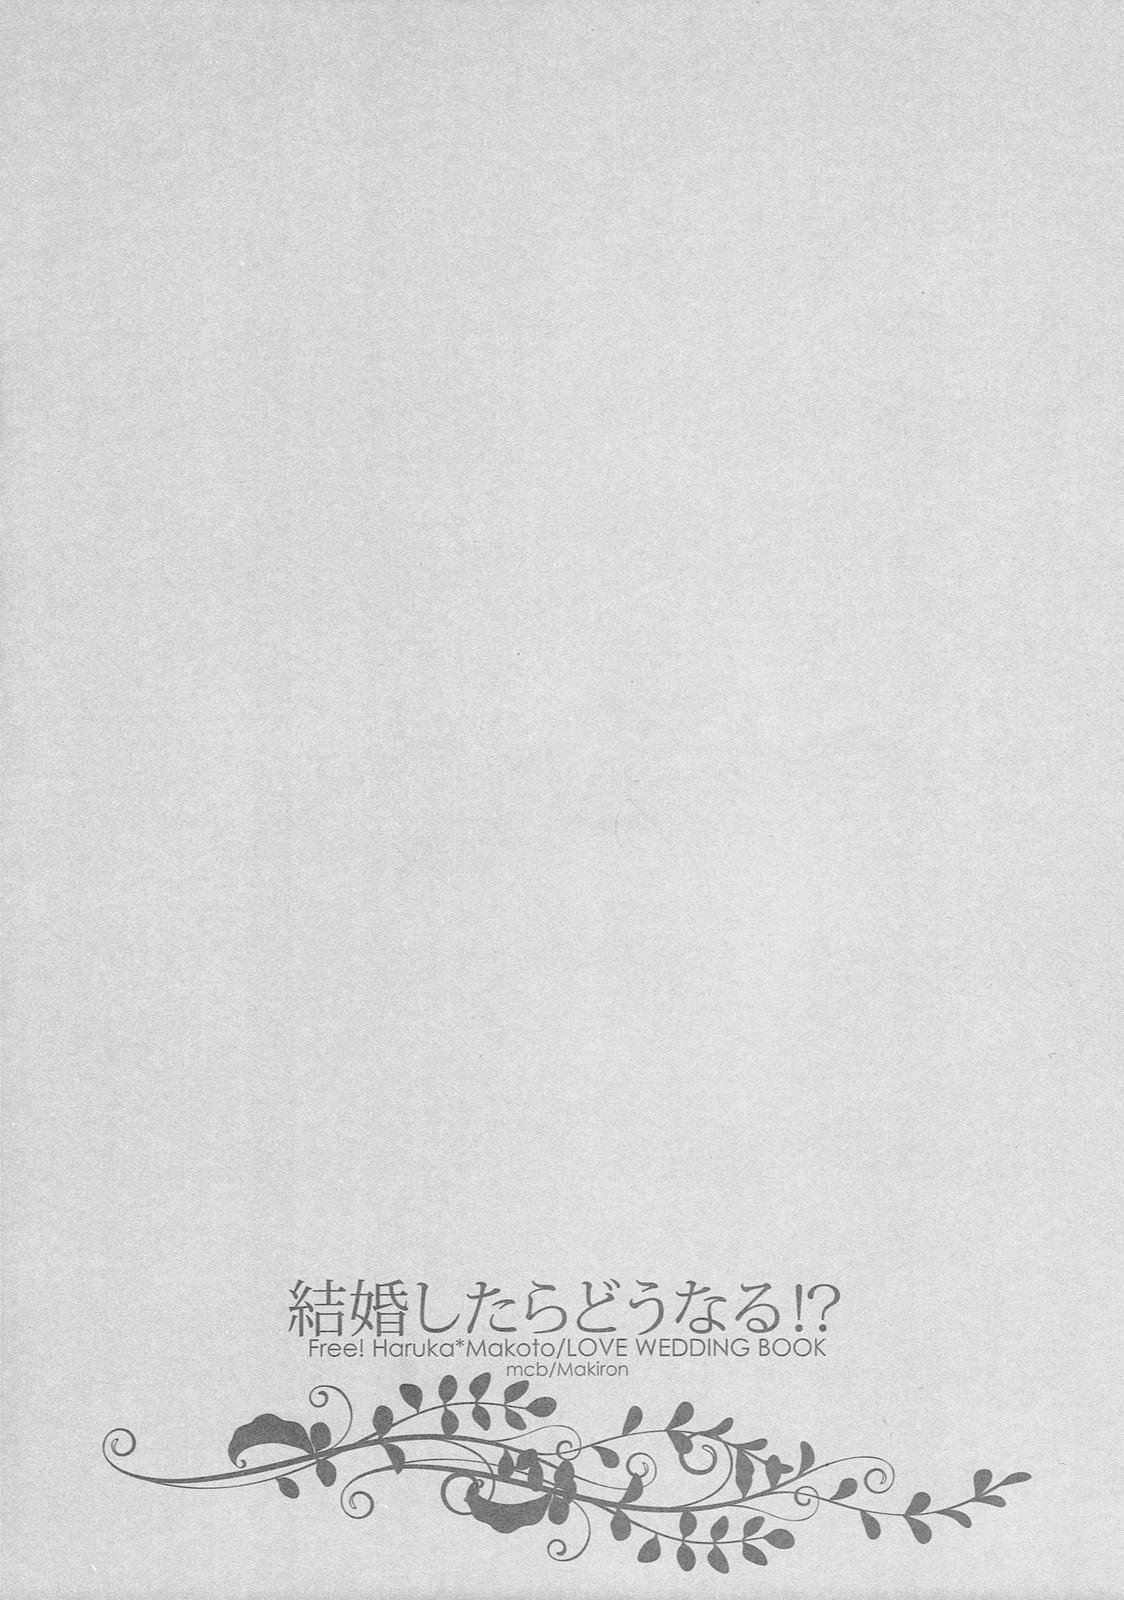 Kekkonshitara Dounaru!? 2 | What If We Were Married!? 2 15